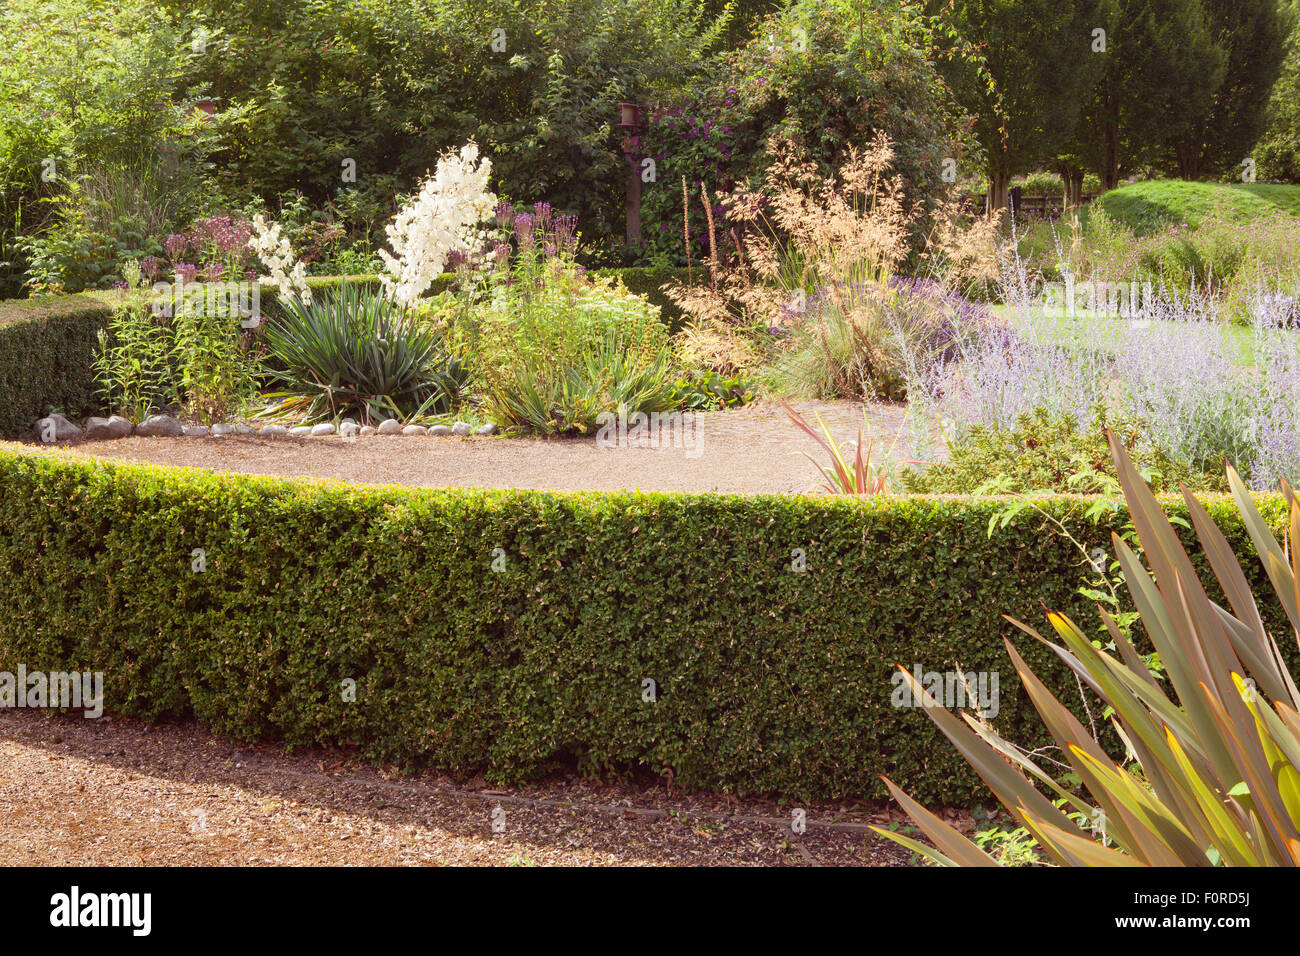 Elsham Hall Gardens and Country Park. Elsham, North Lincolnshire, UK ...